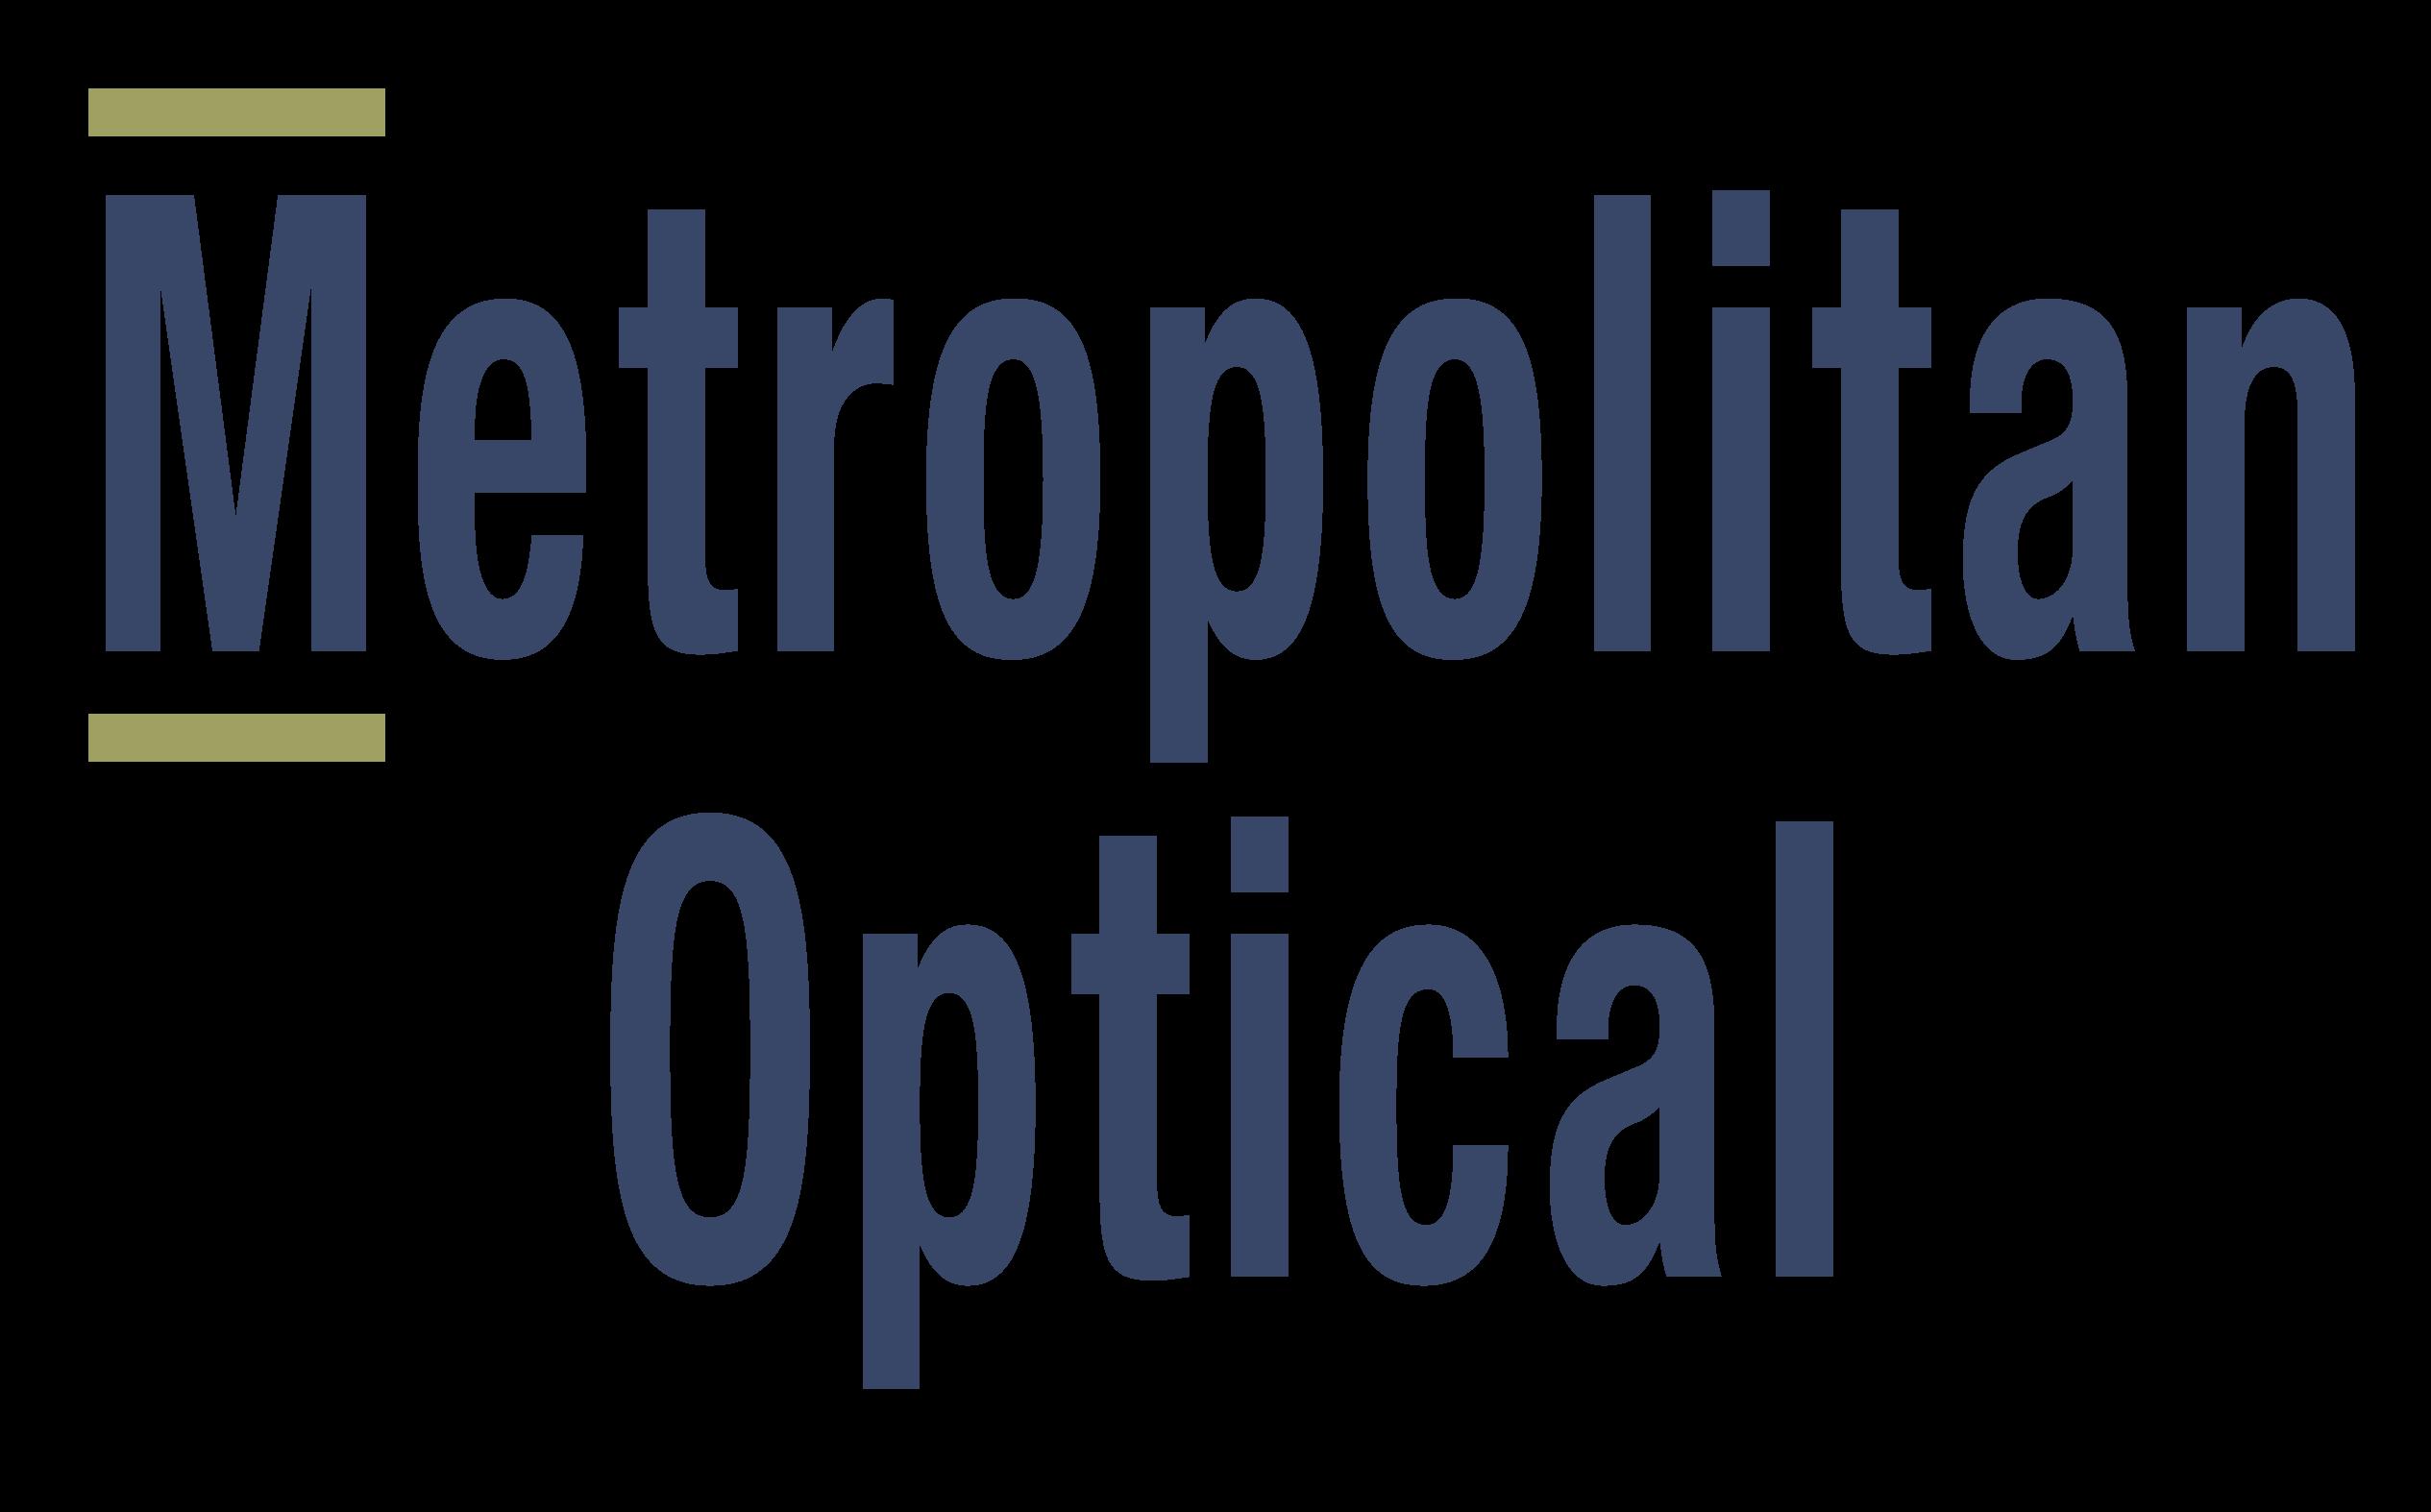 Metropolitan Optical - 2